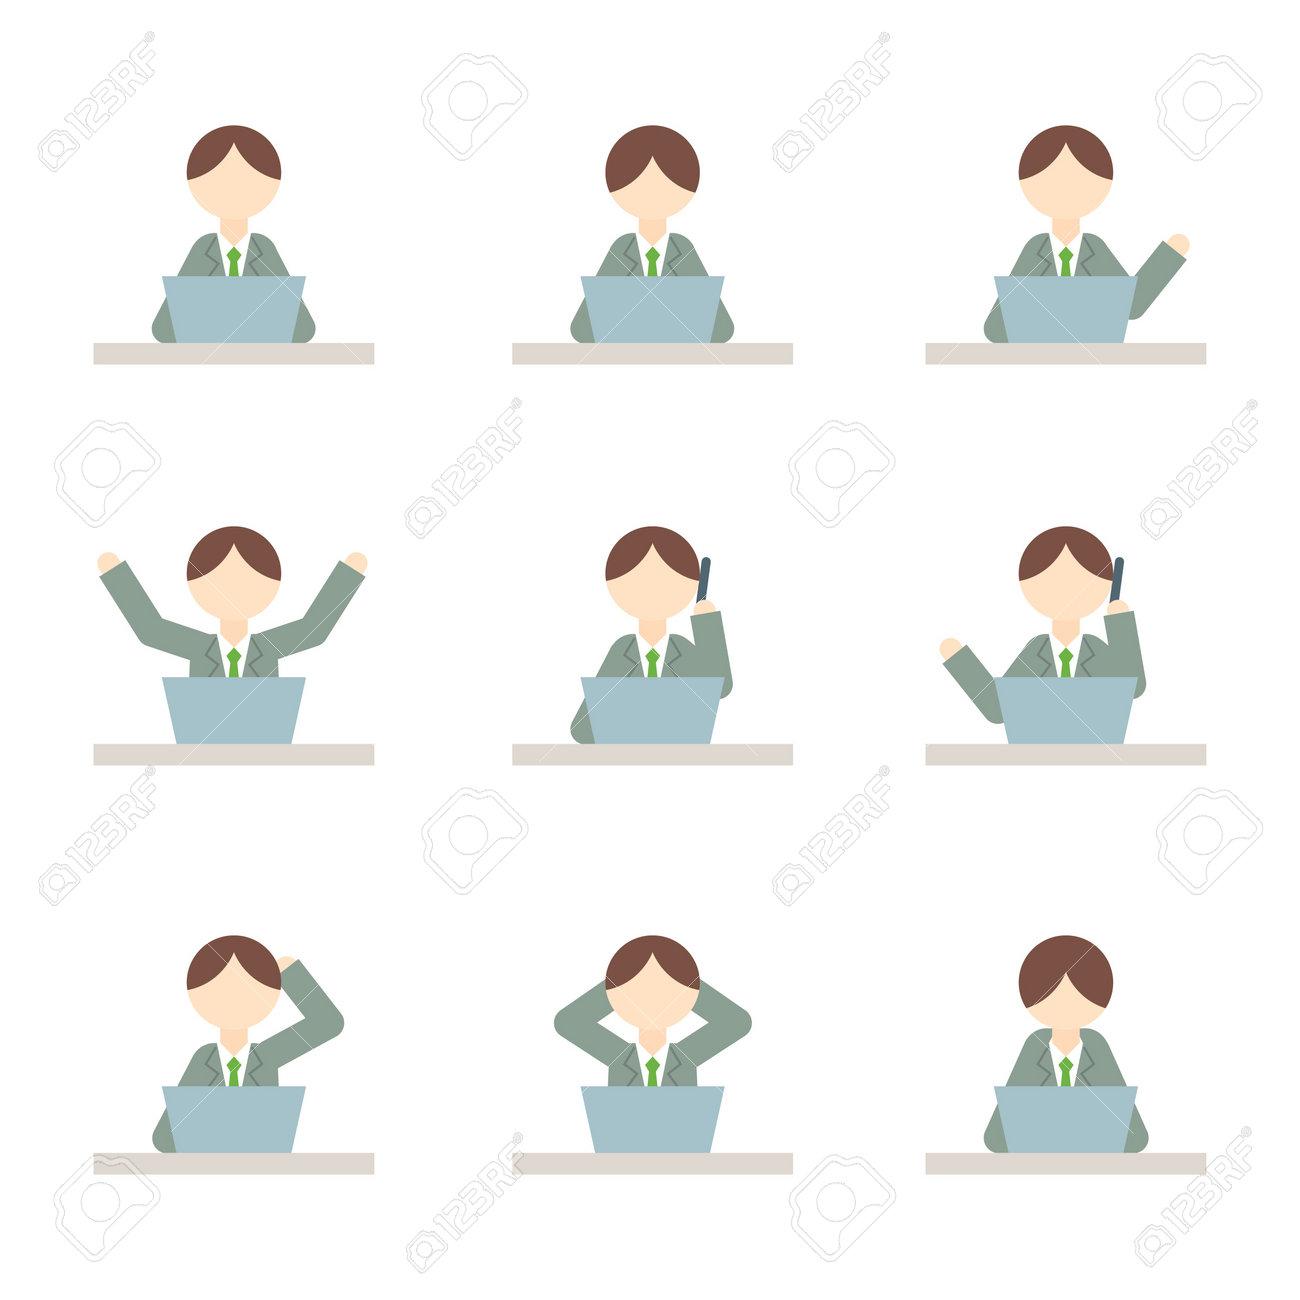 Flat Icon Person Businessman Male - 168585539